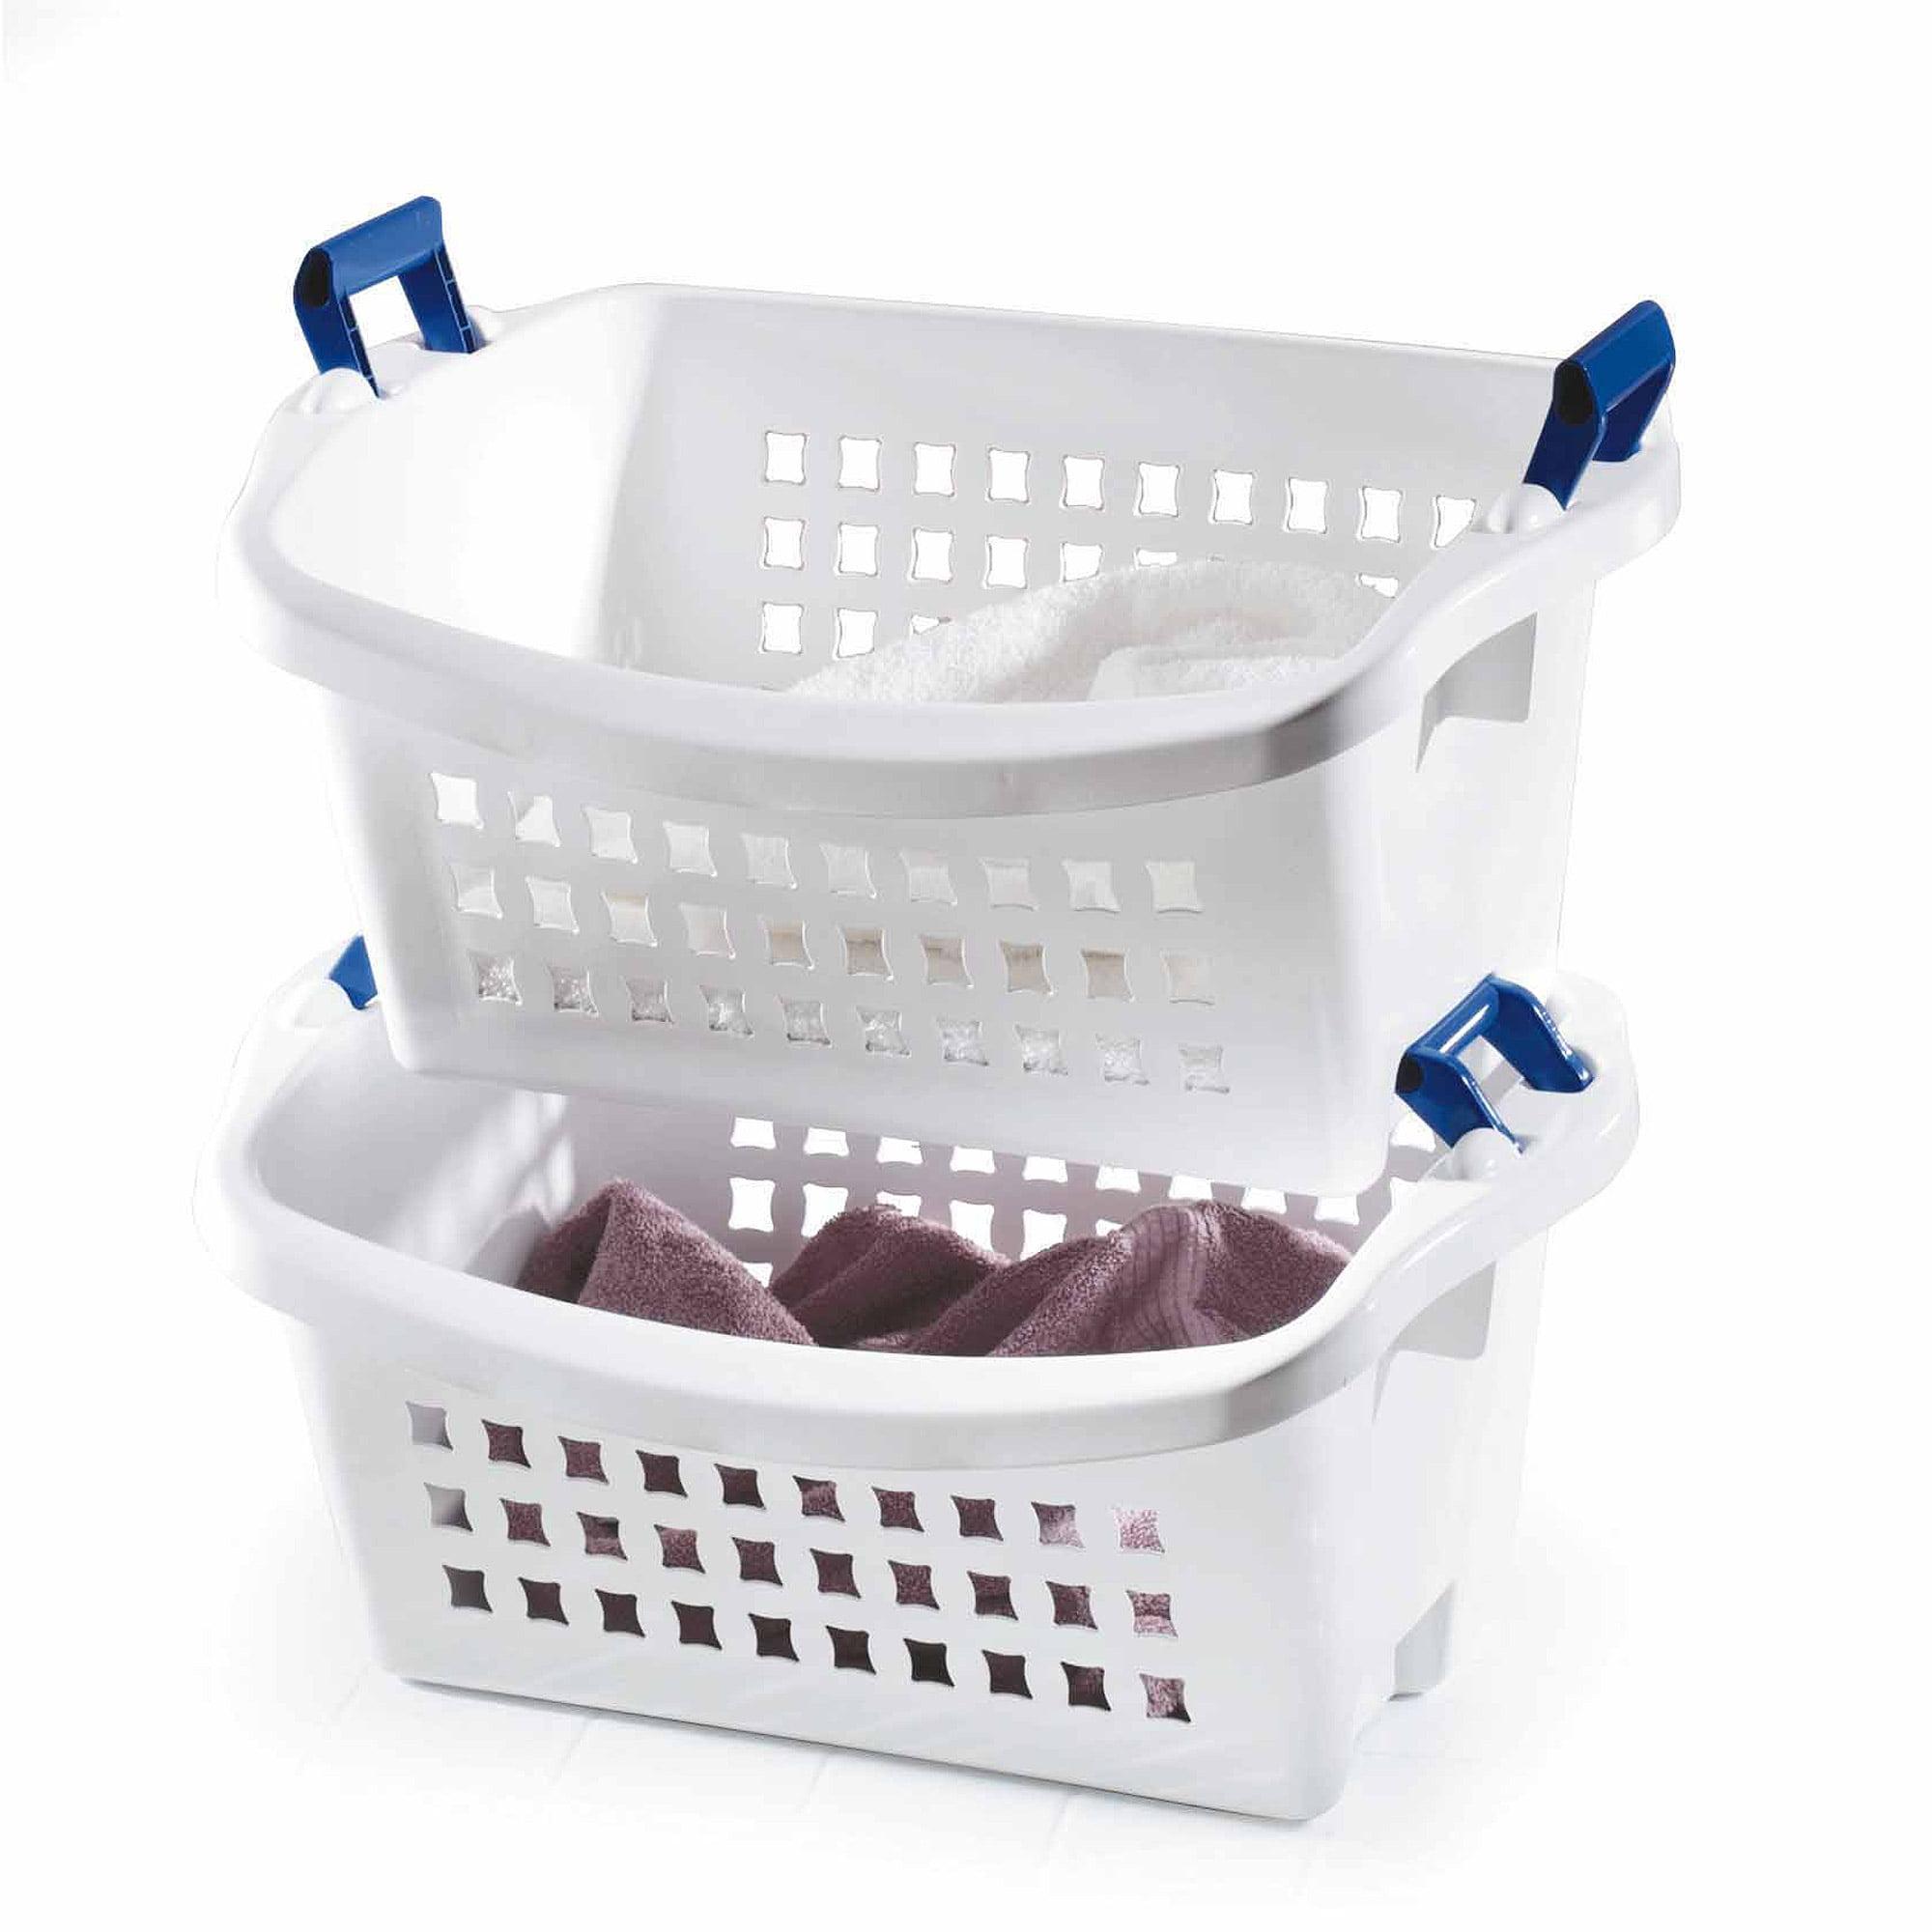 Rubbermaid 1.6 BU Stack-n-Sort Laundry Basket, White (1 Piece)